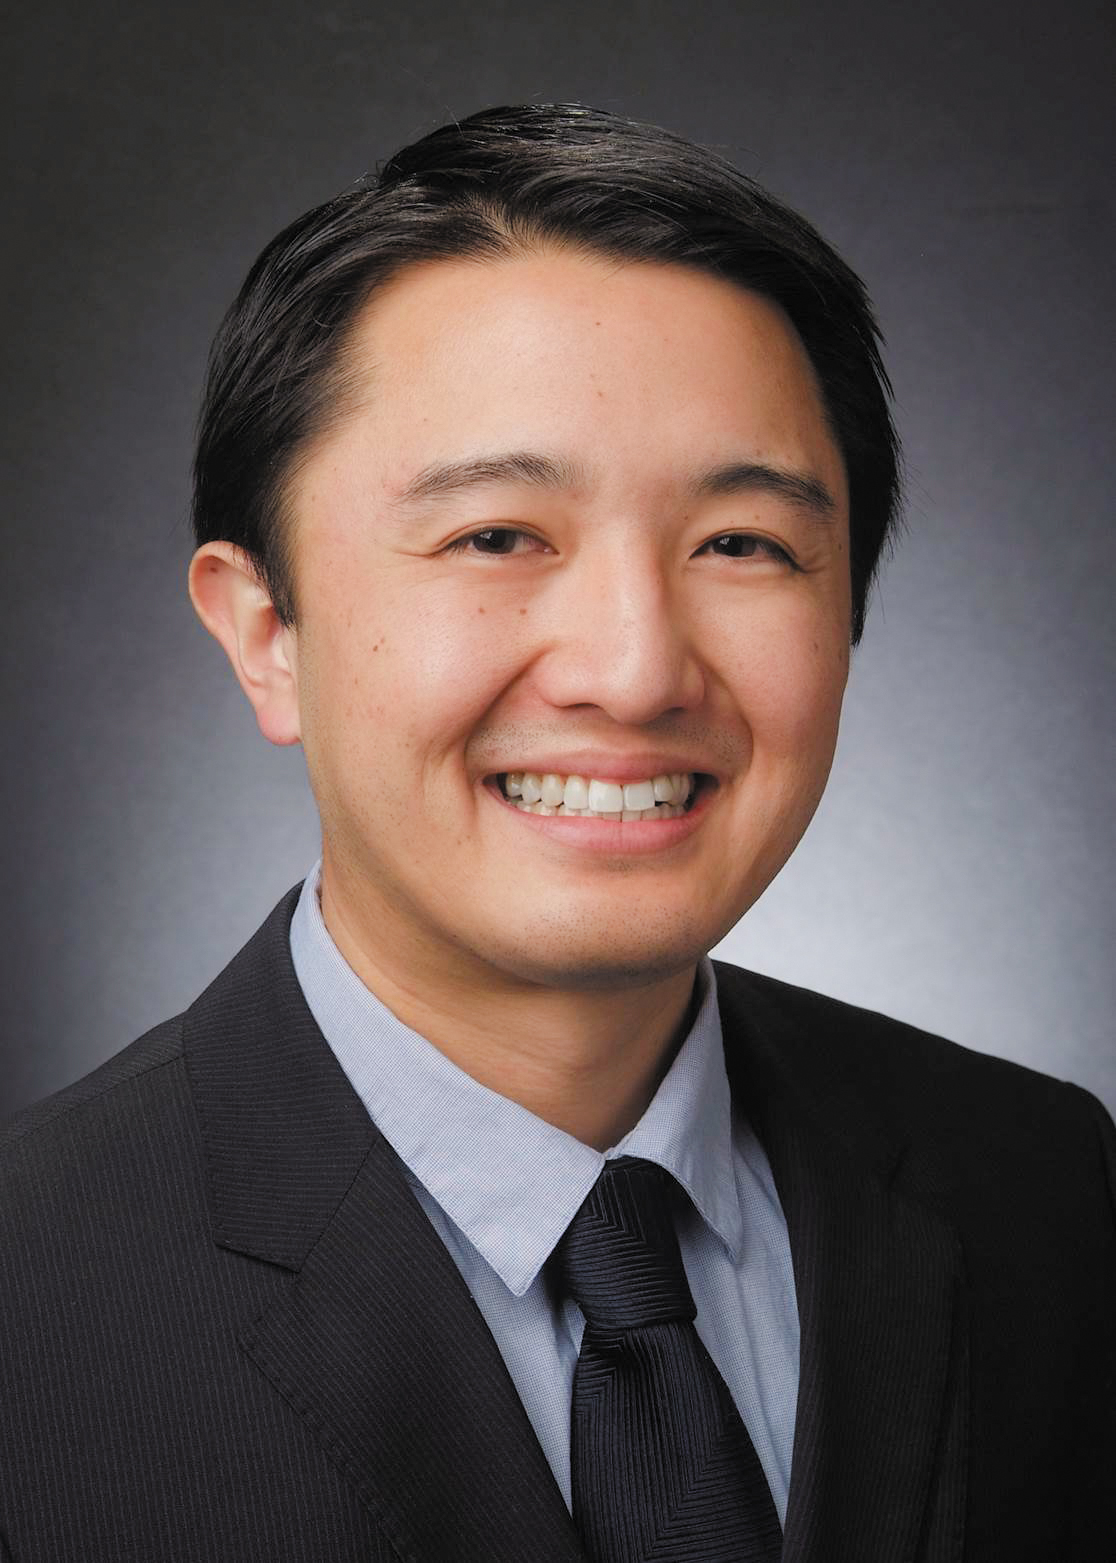 Nicholas J. Fujii, D.D.S.